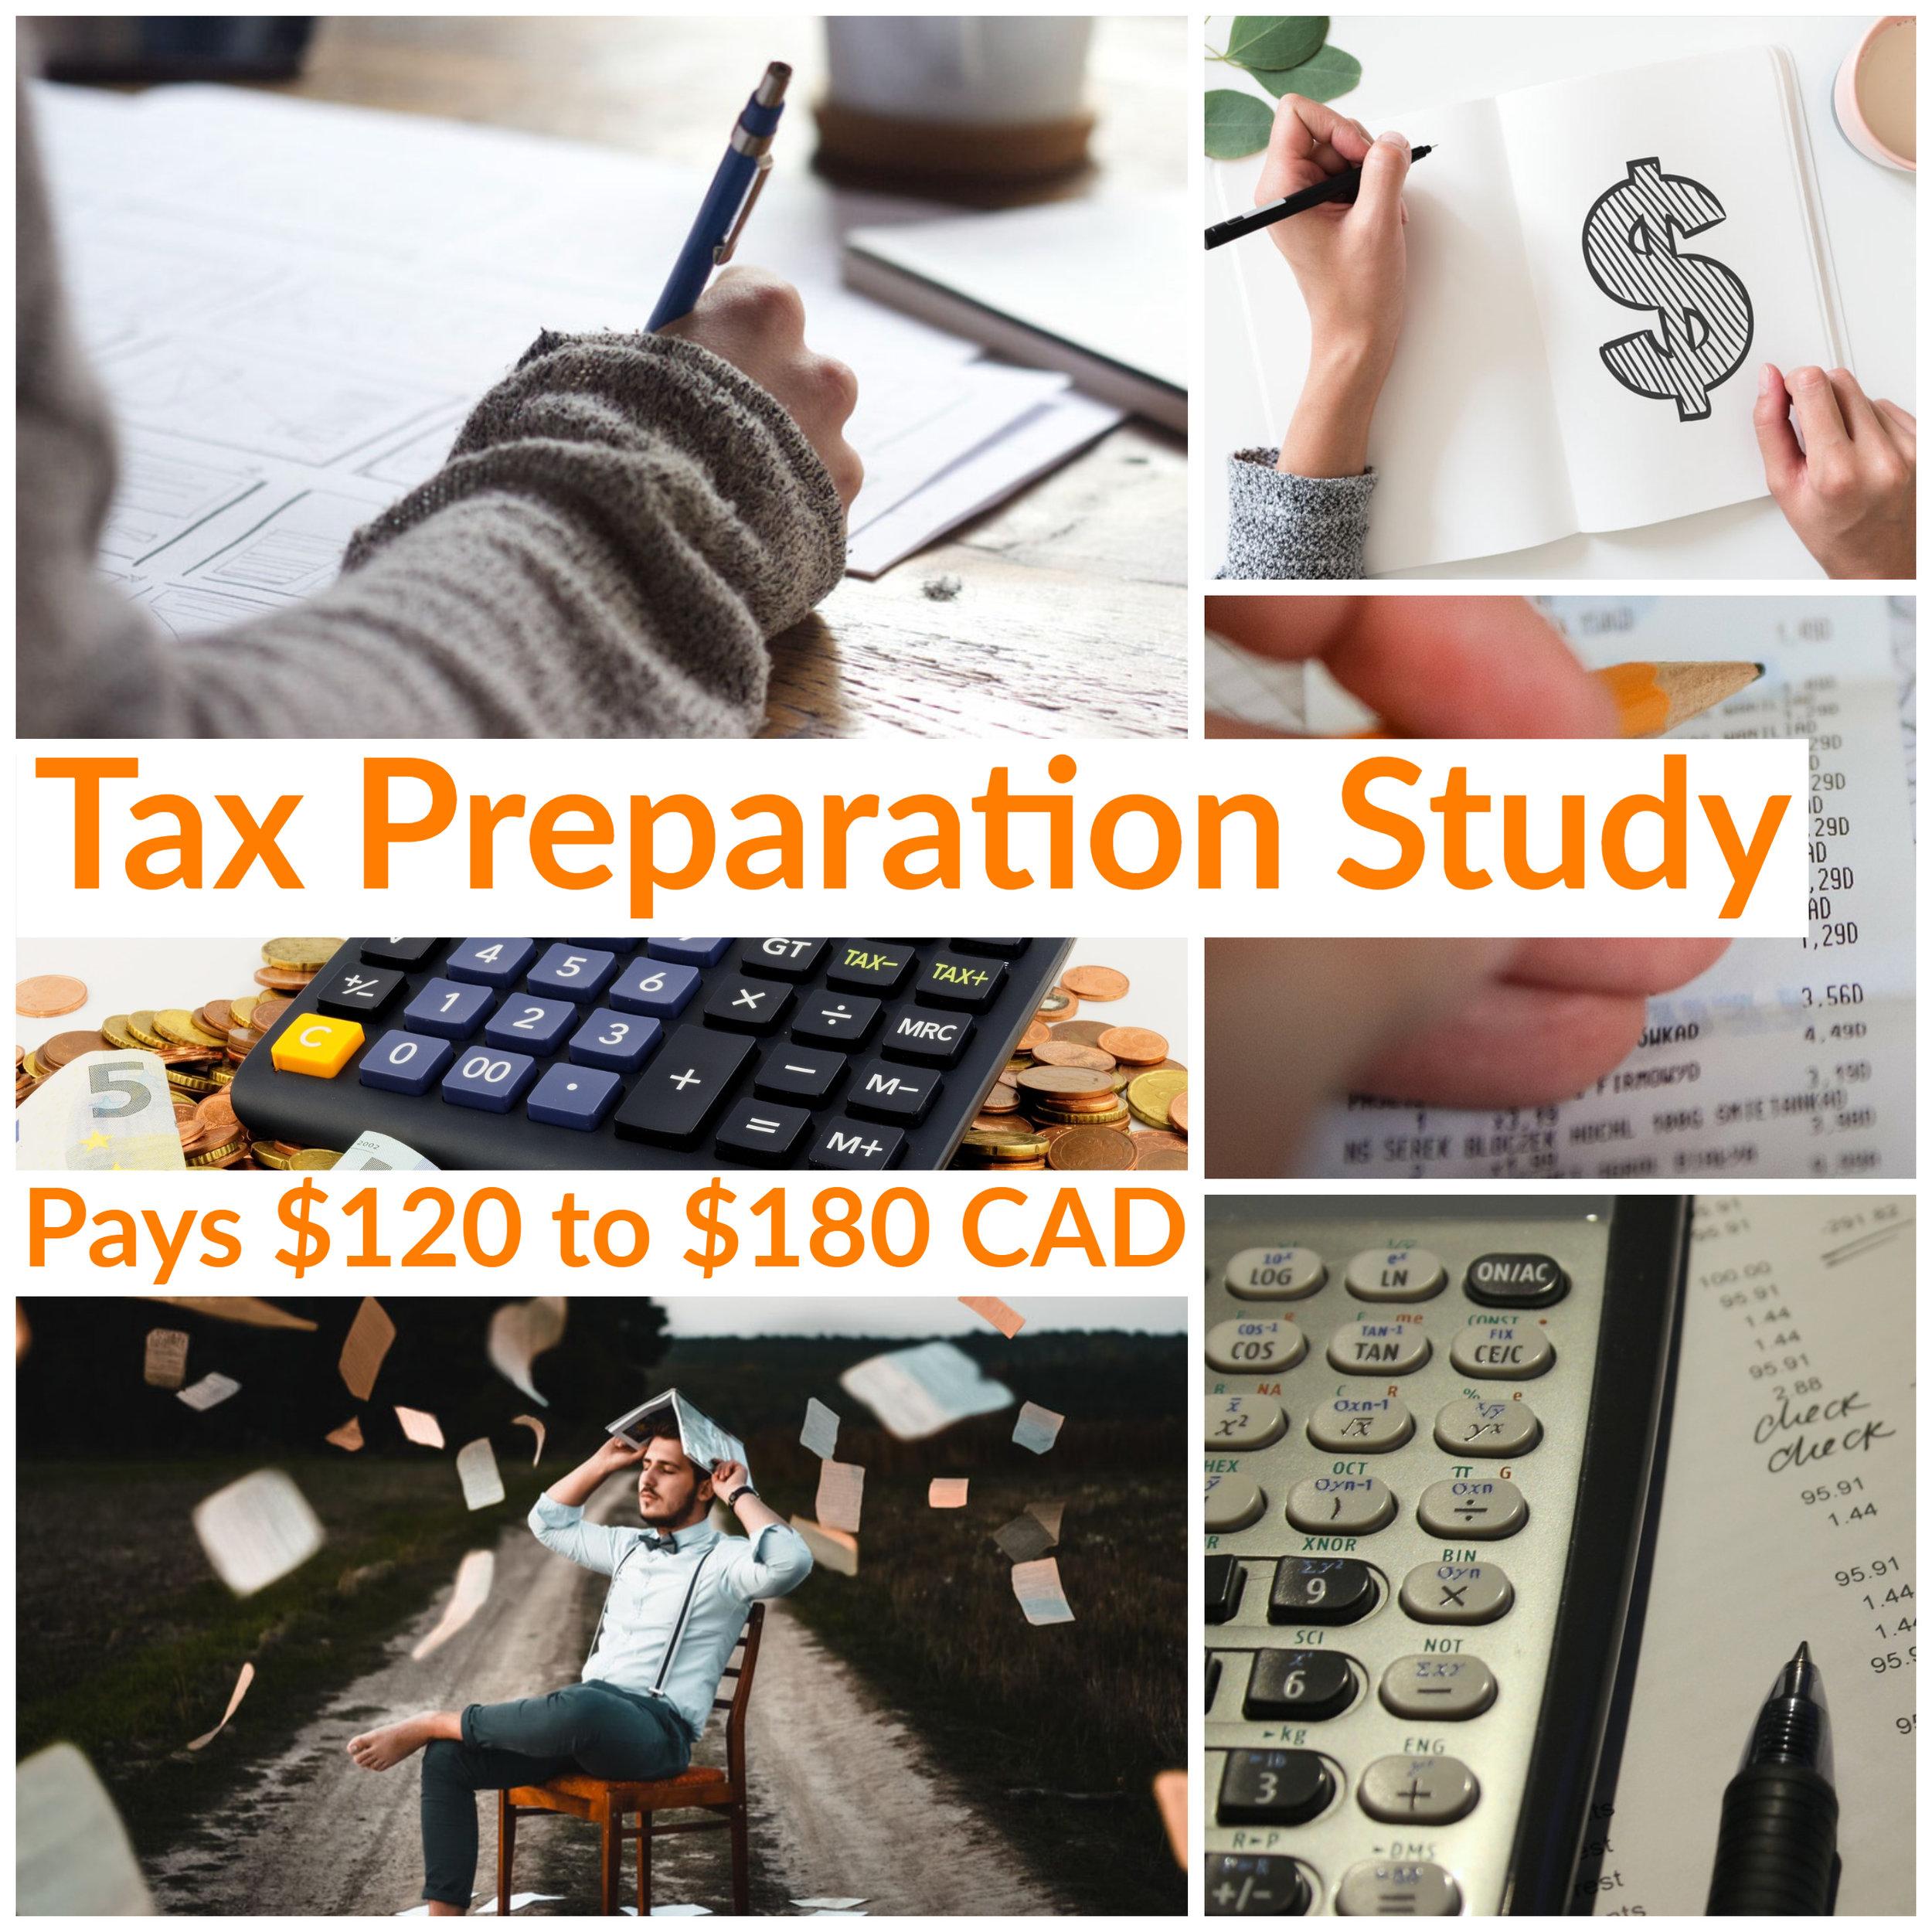 Gold & Gold - Tax Preparation Study.jpg